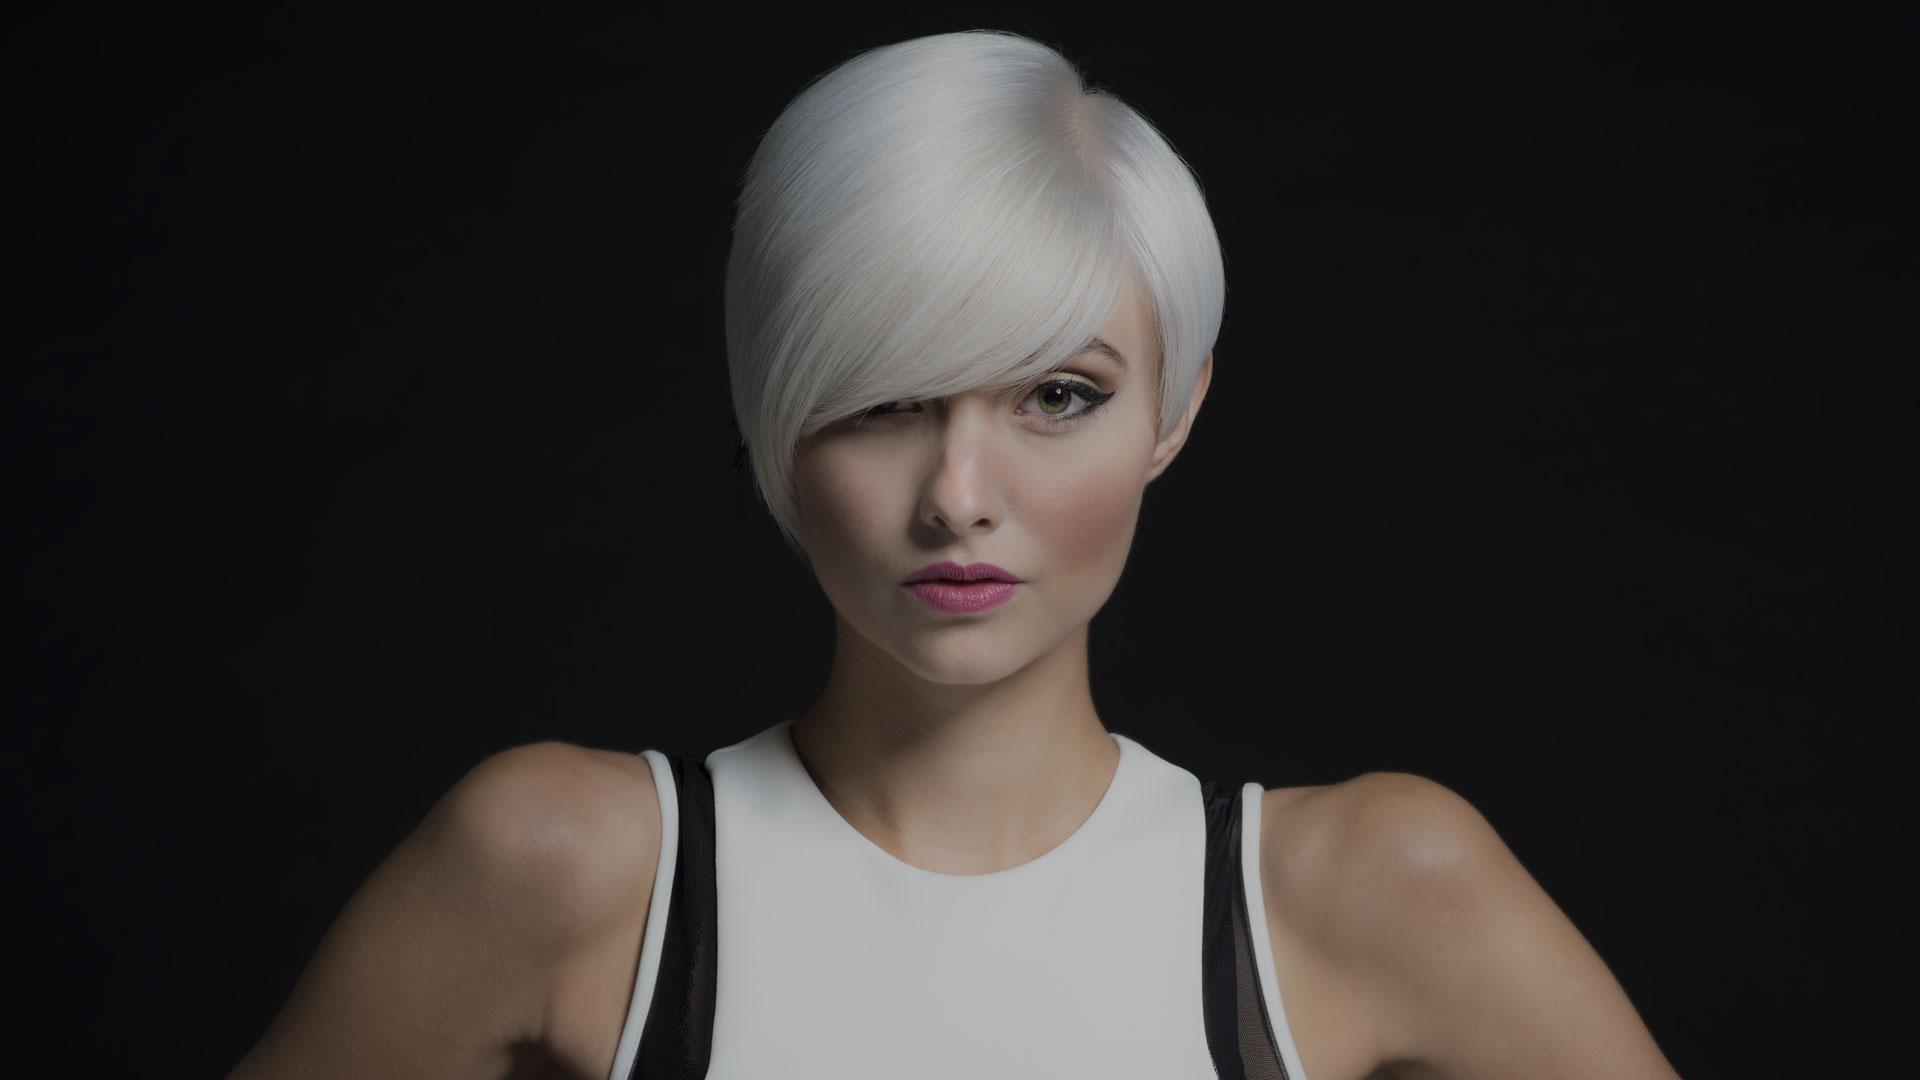 Dallas Best Hair salon Plano Best hair salon Frisco Best Hair salon Allen McKinney Addison Best hair Stylist Hair Colorist Haircut Men Women Kerastase Shu Uemura Male Top Salons 2015